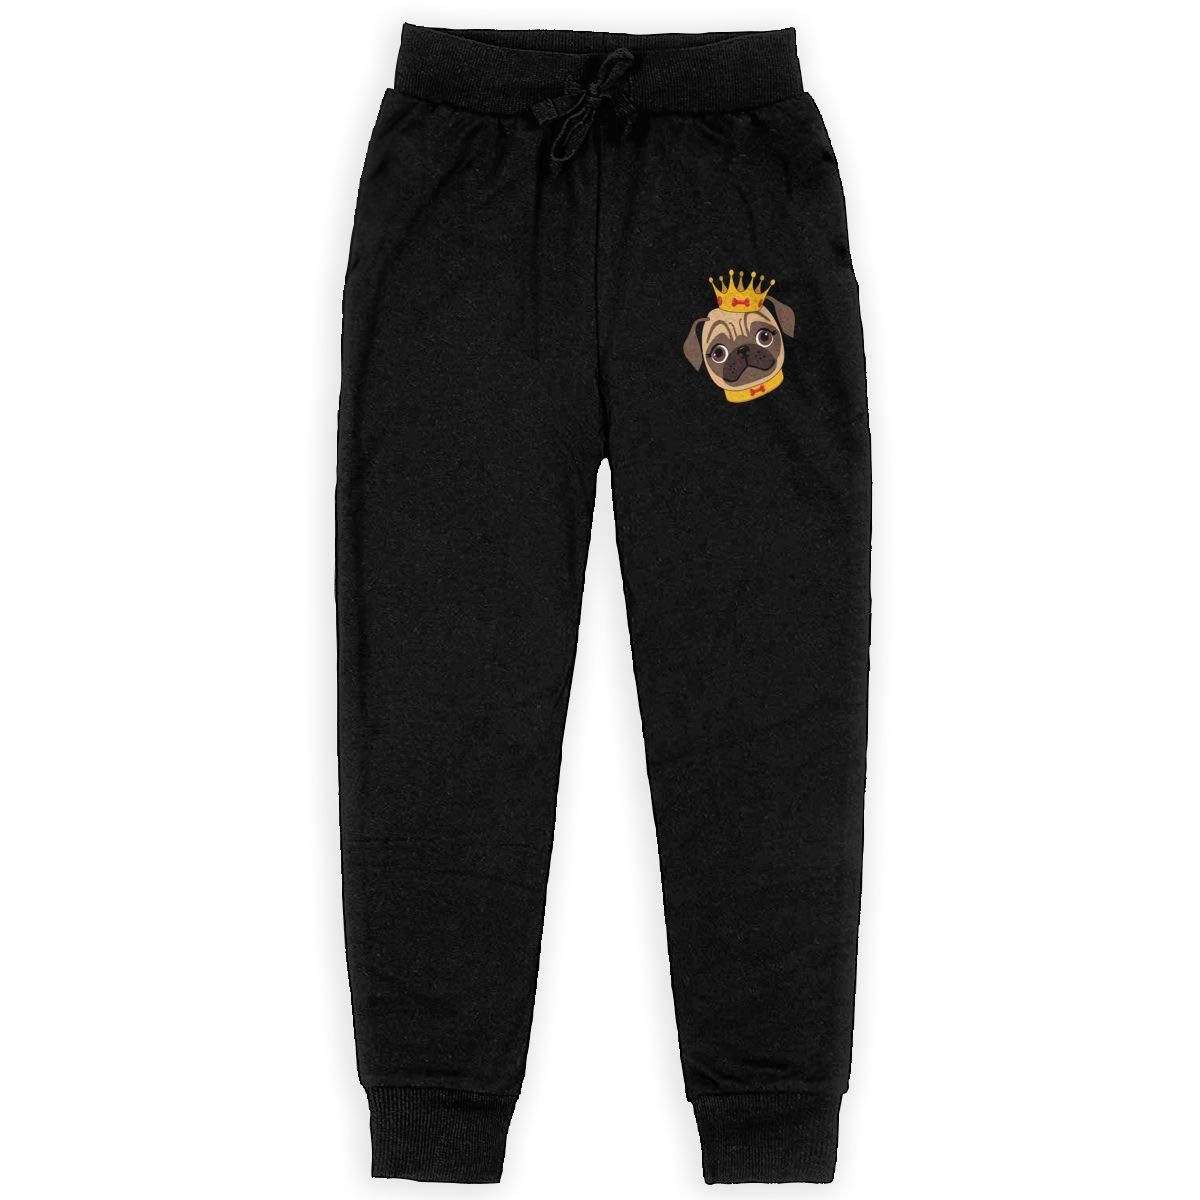 IufnNRJndfu Pug Dog Logo Boys Athletic Smart Fleece Pant Youth Soft and Cozy Sweatpants